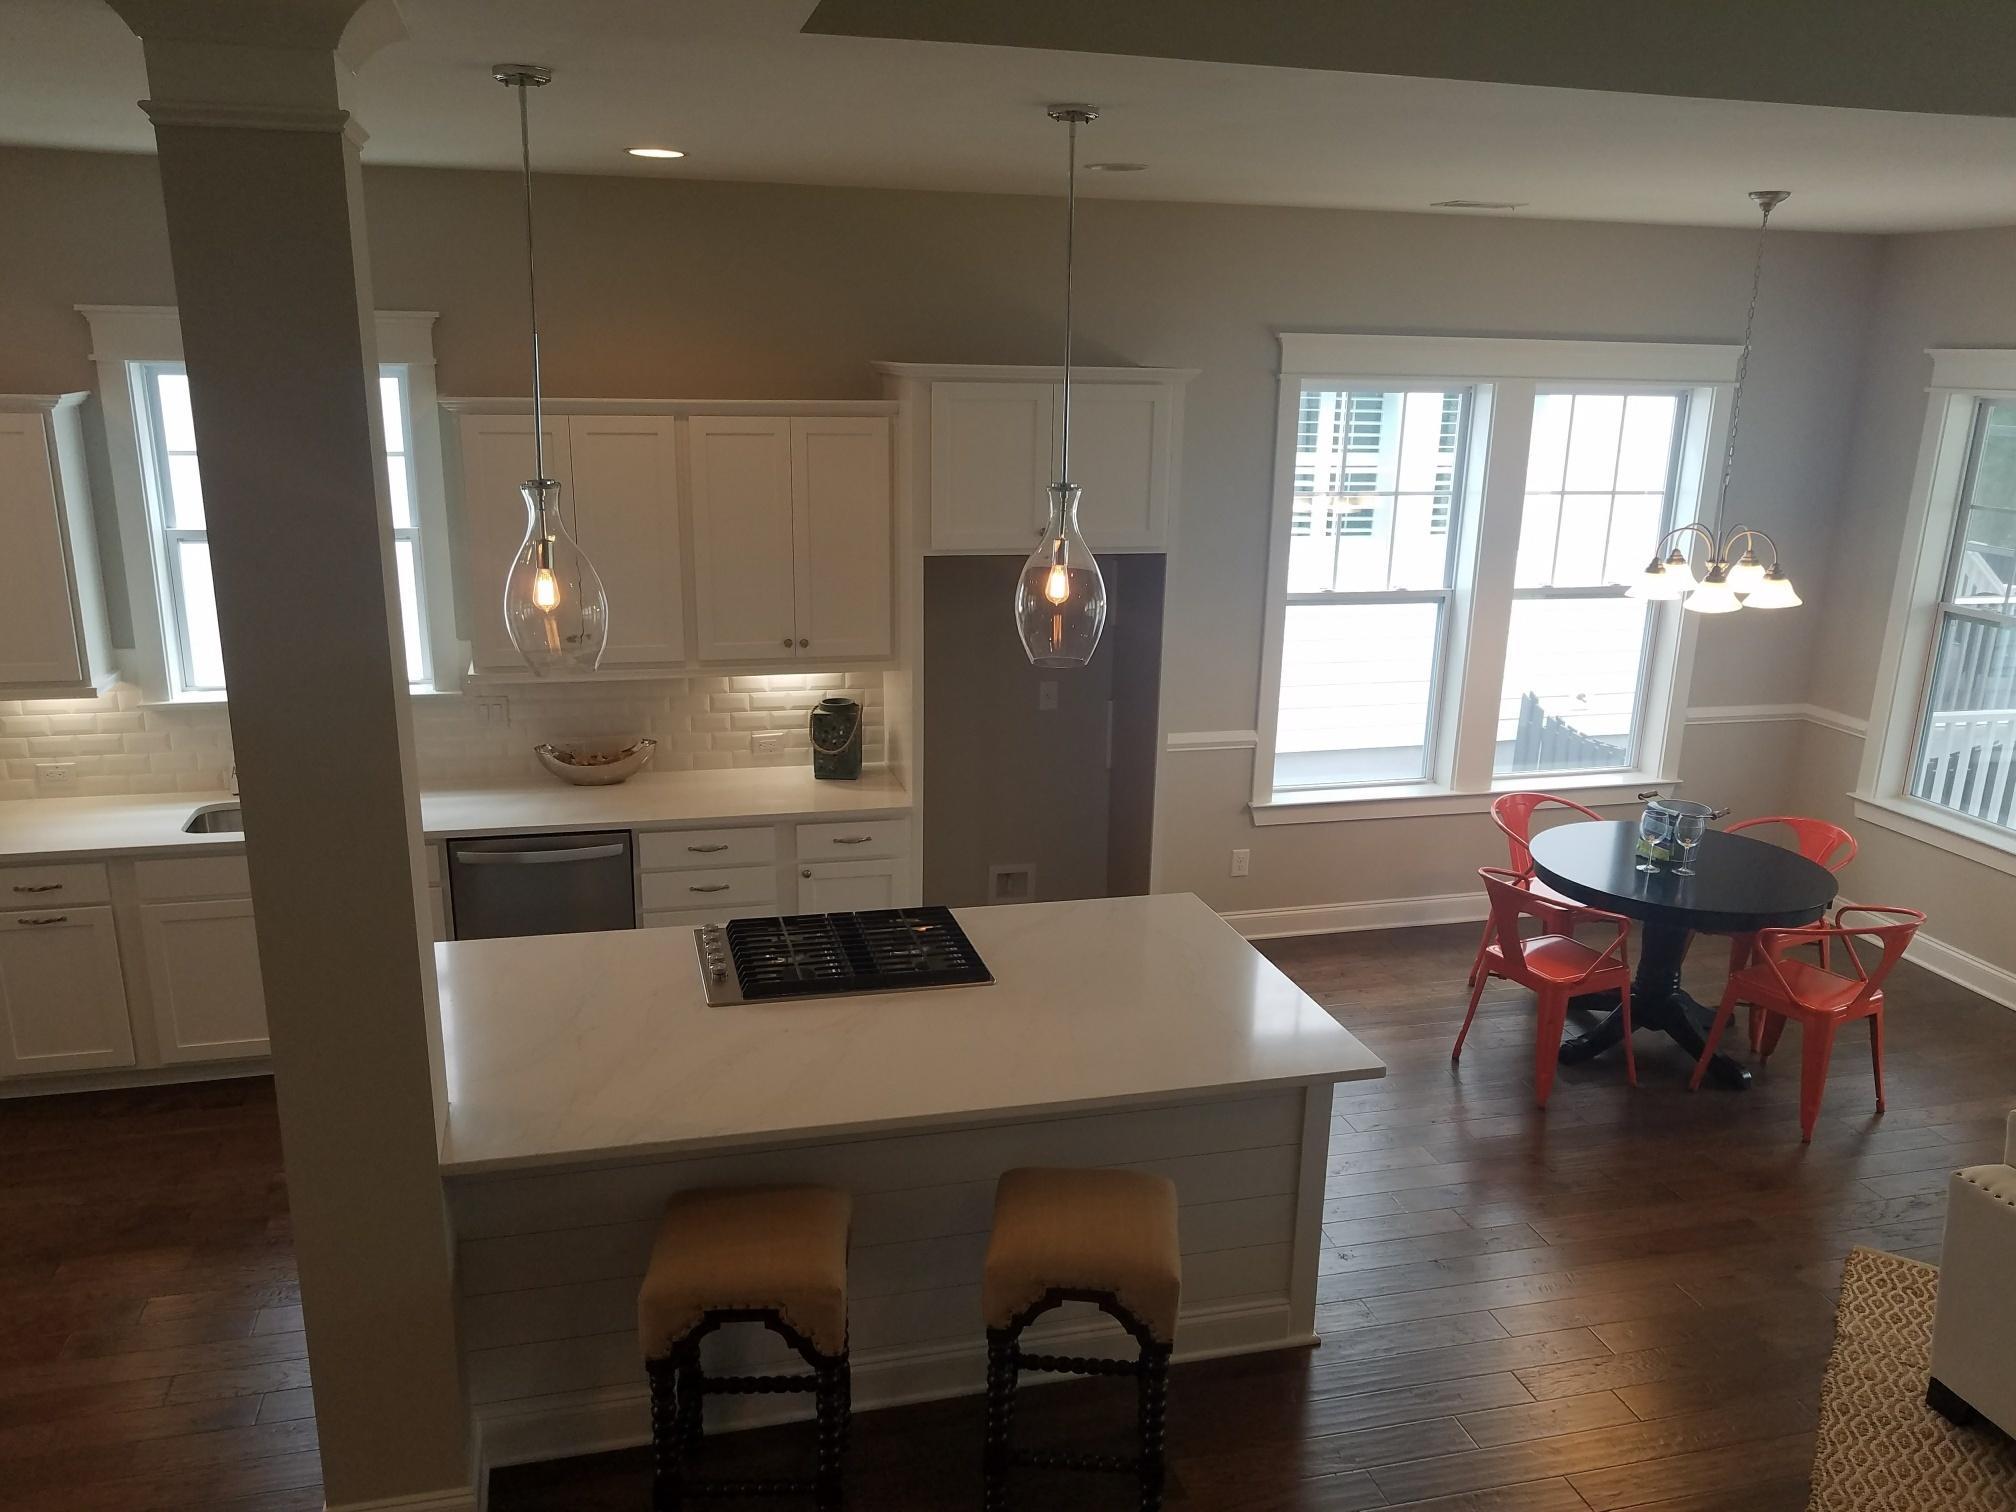 Carolina Park Homes For Sale - 1583 Old Rivers Gate, Mount Pleasant, SC - 27